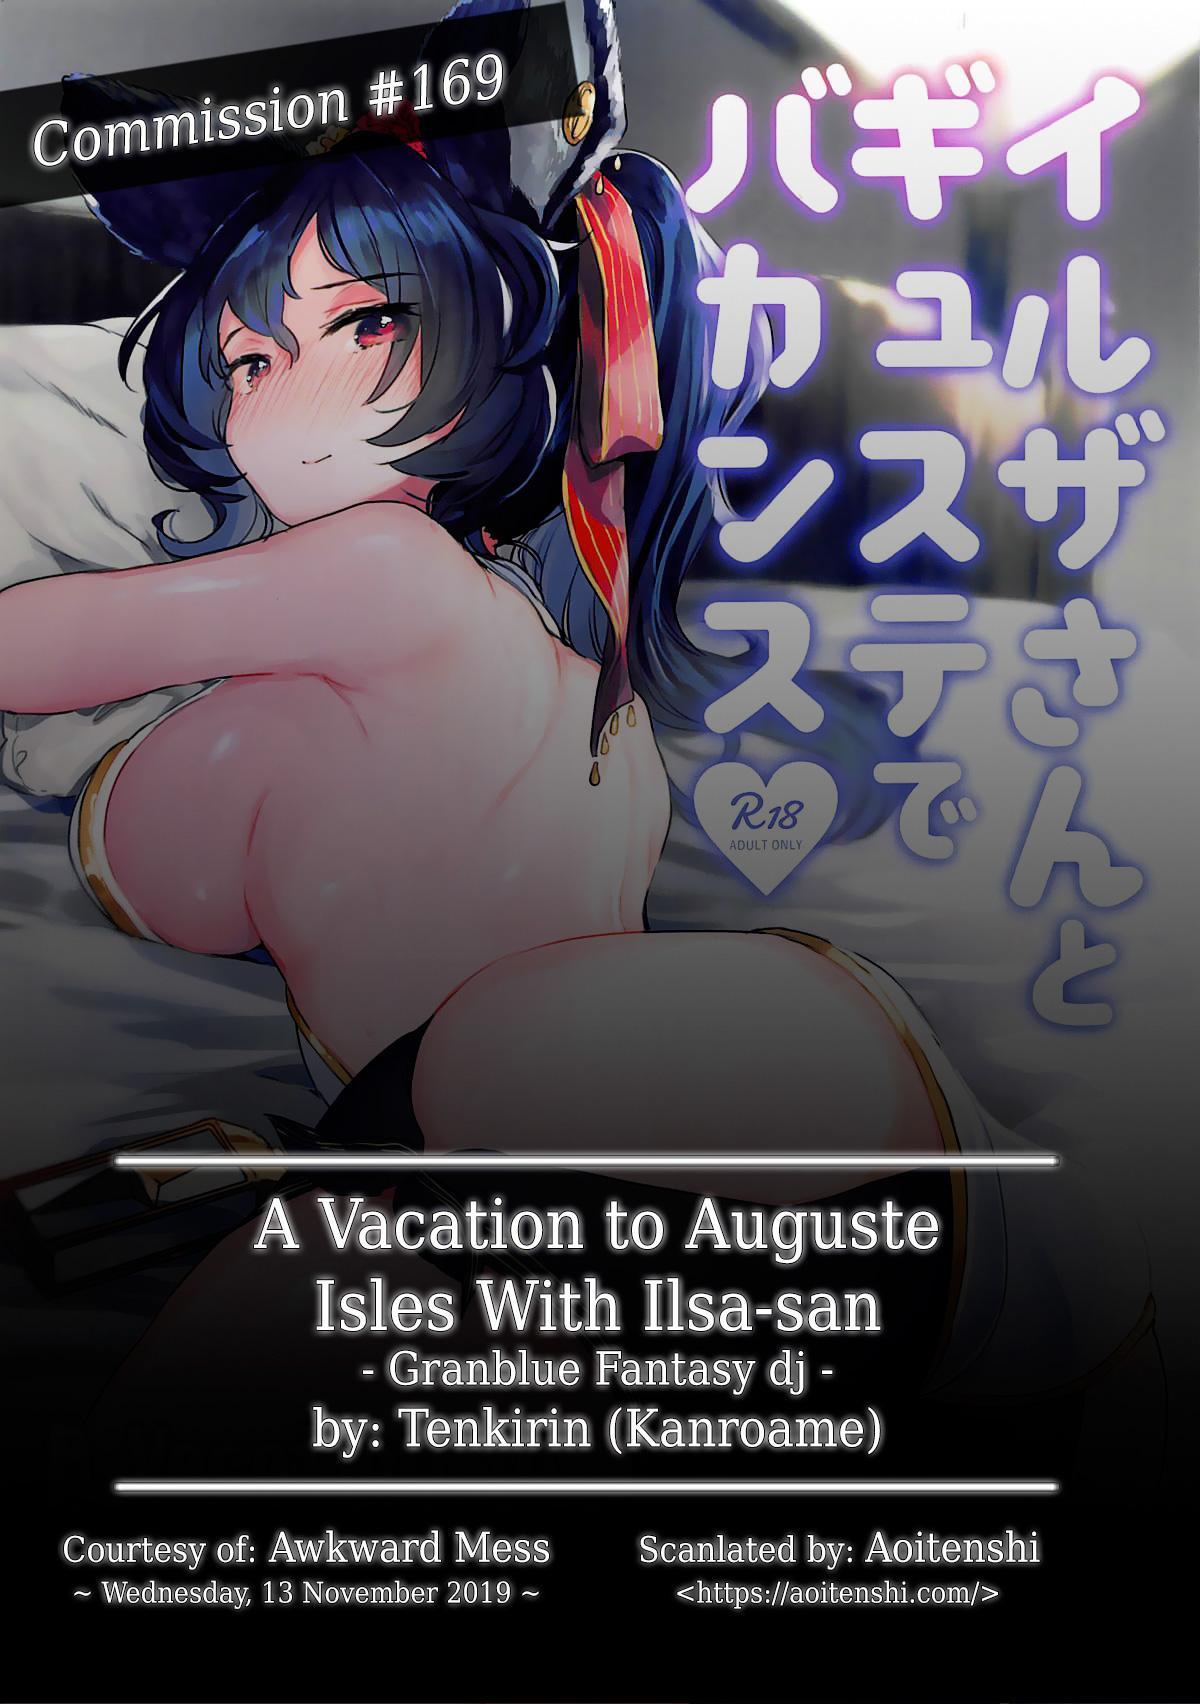 (COMIC1☆15) [Tenkirin (Kanroame)] Ilsa-san to Guste de Vacances | A Vacation to Auguste Isles With Ilsa-san (Granblue Fantasy) [English] [Aoitenshi] 1